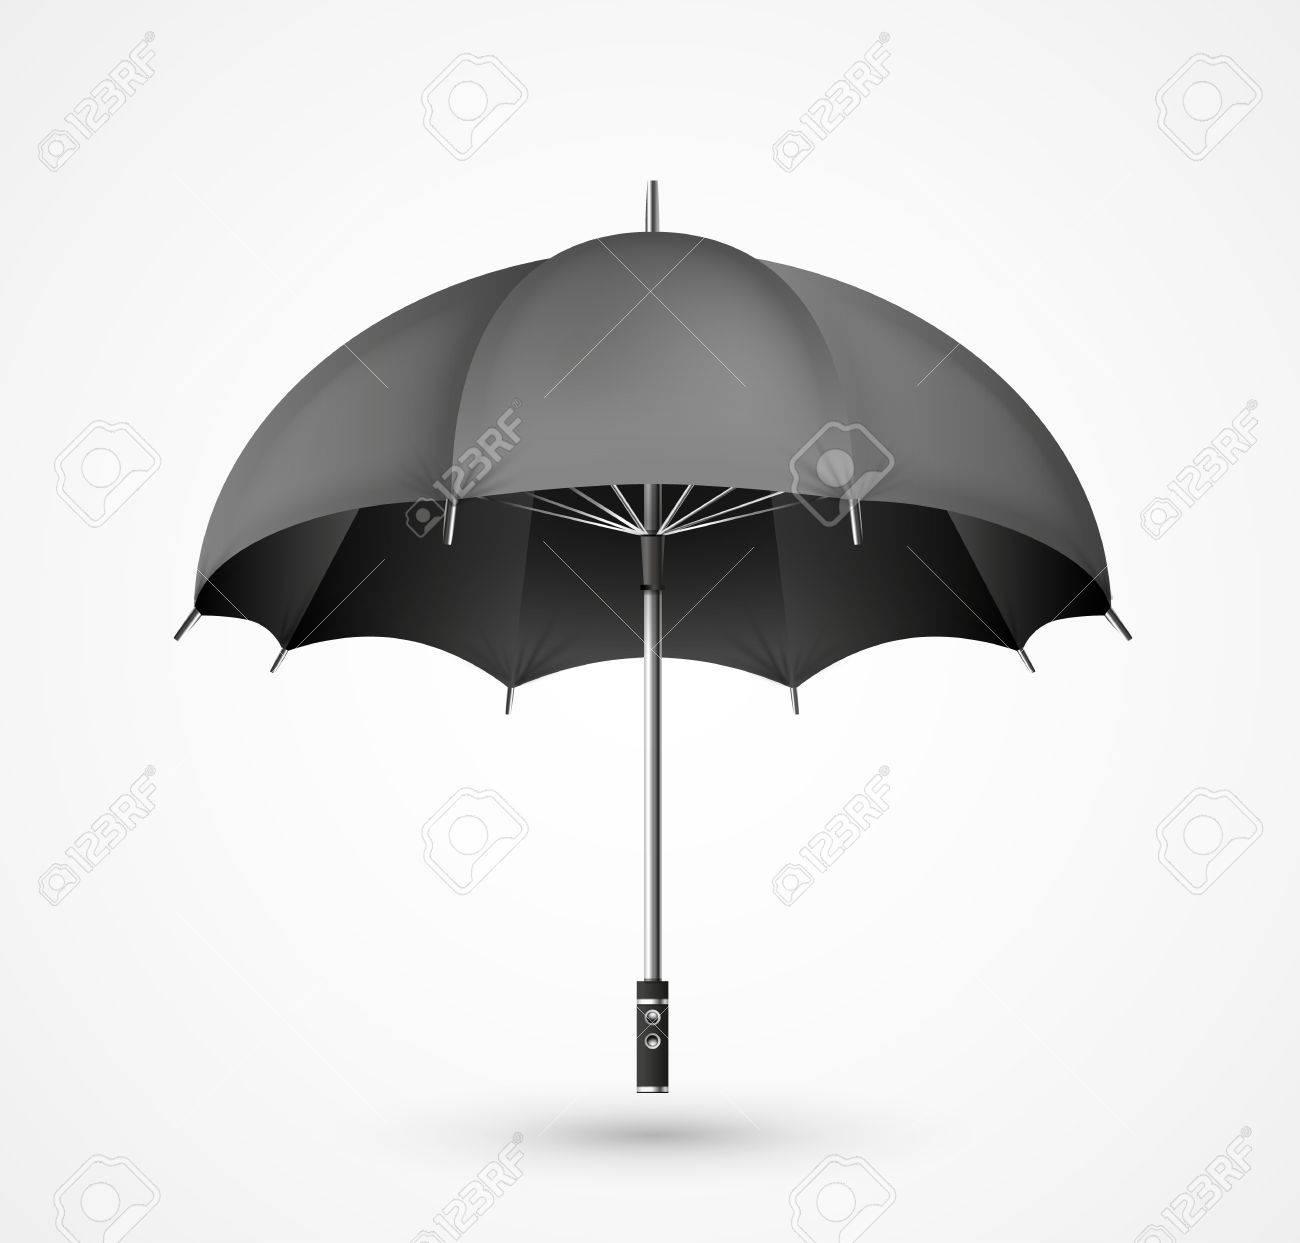 umbrella icon Stock Vector - 19049651